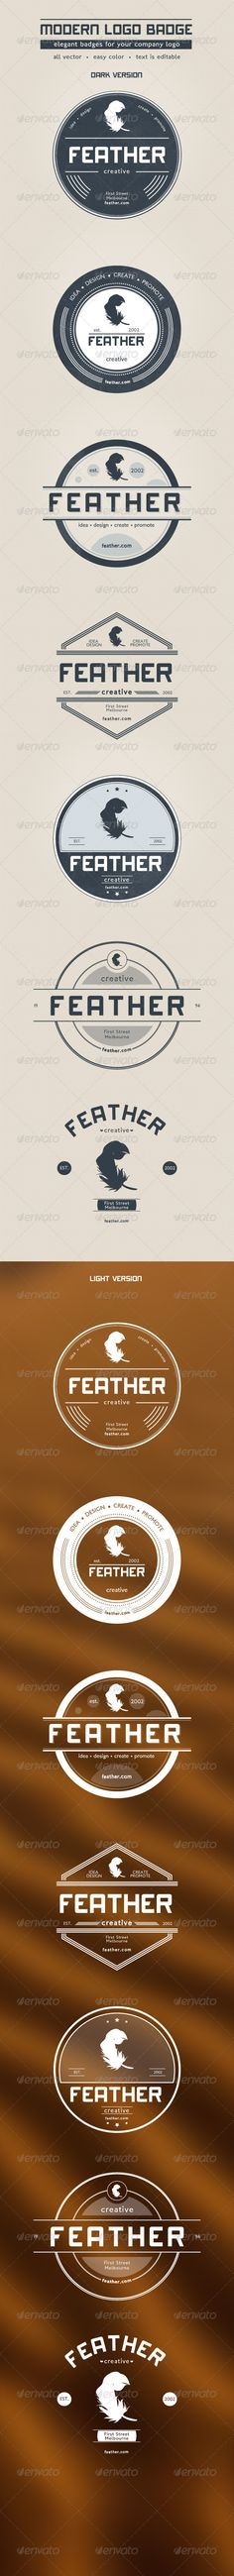 Modern Logo Badge - GraphicRiver Item for Sale